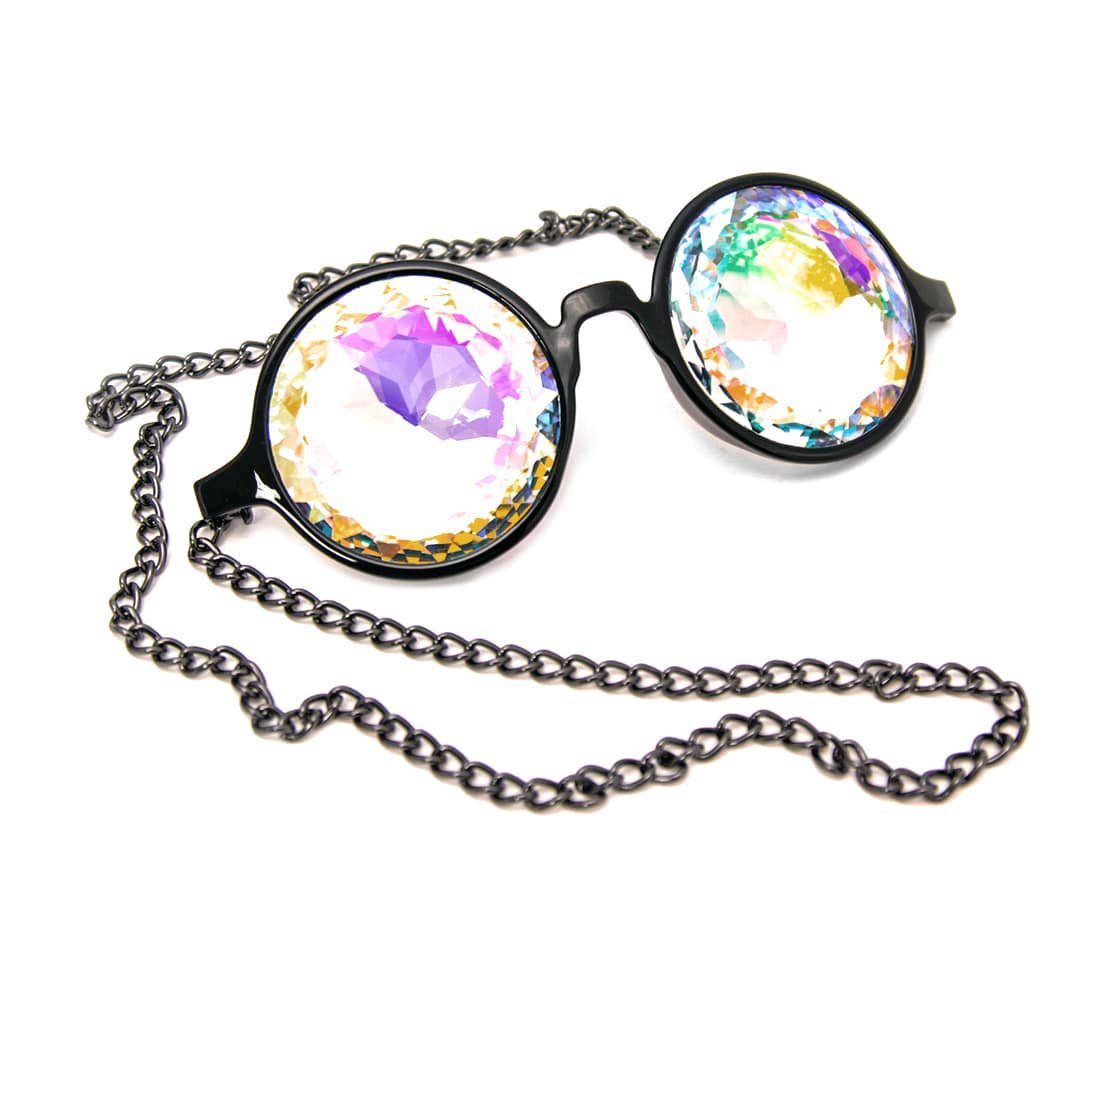 GloFX Chain Kaleidoscope Glasses Rainbow Rave Prism Diffraction